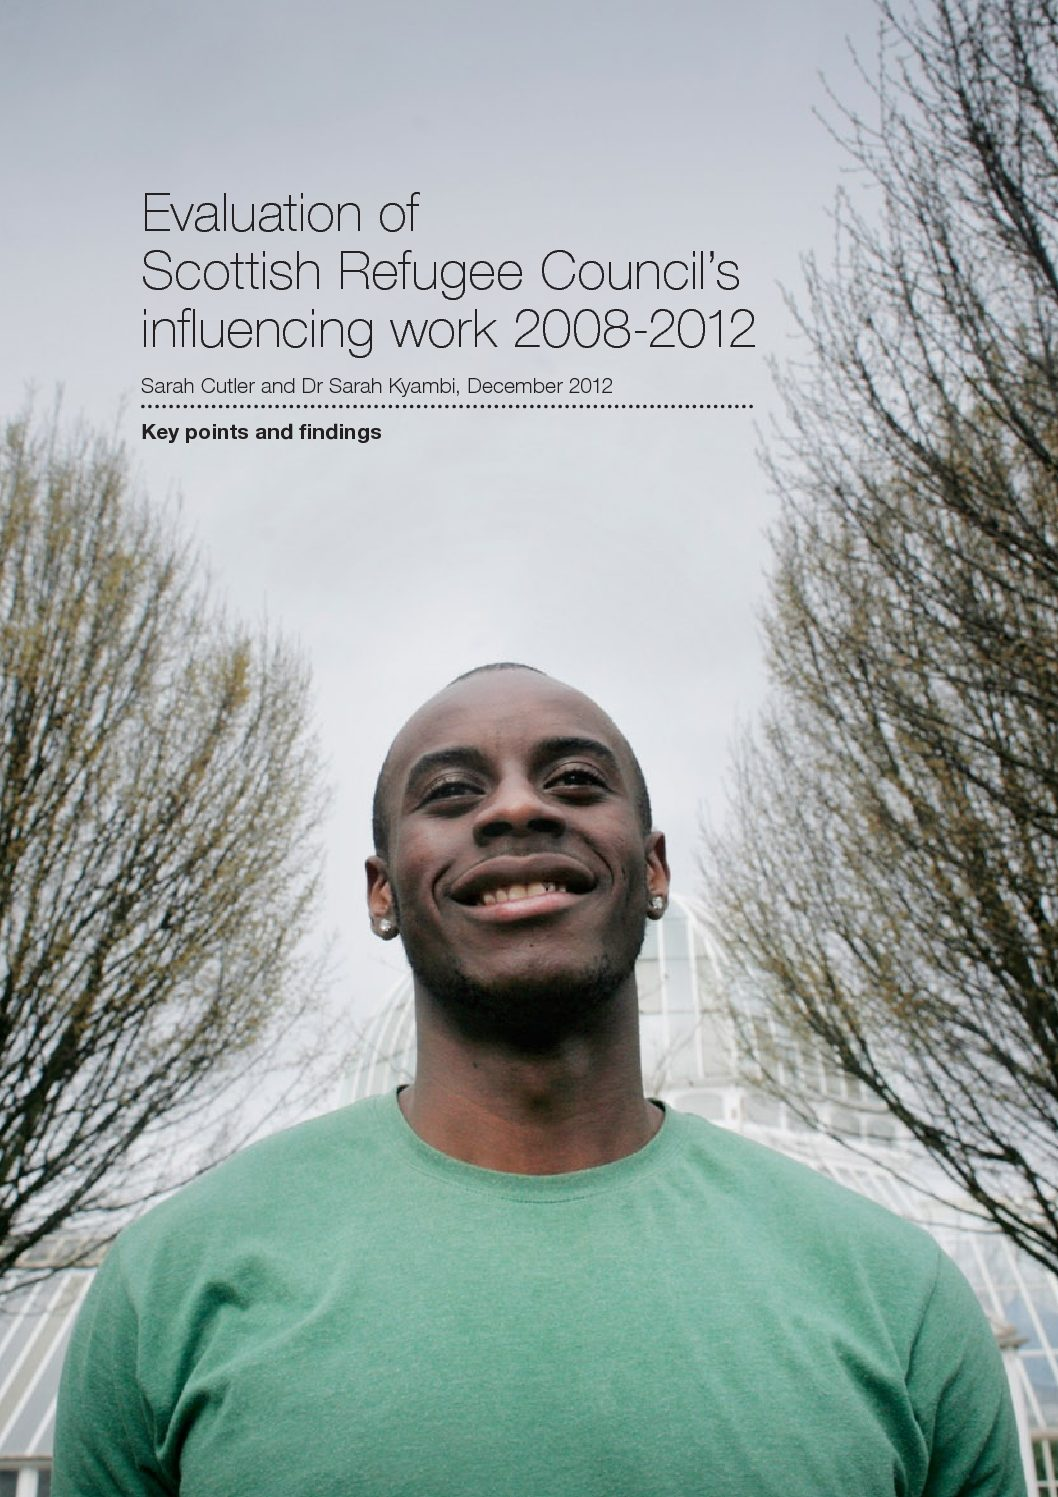 Evaluation-of-Scottish-Refugee-Council_s-influencing-work-2008-2012-PDF-pdf